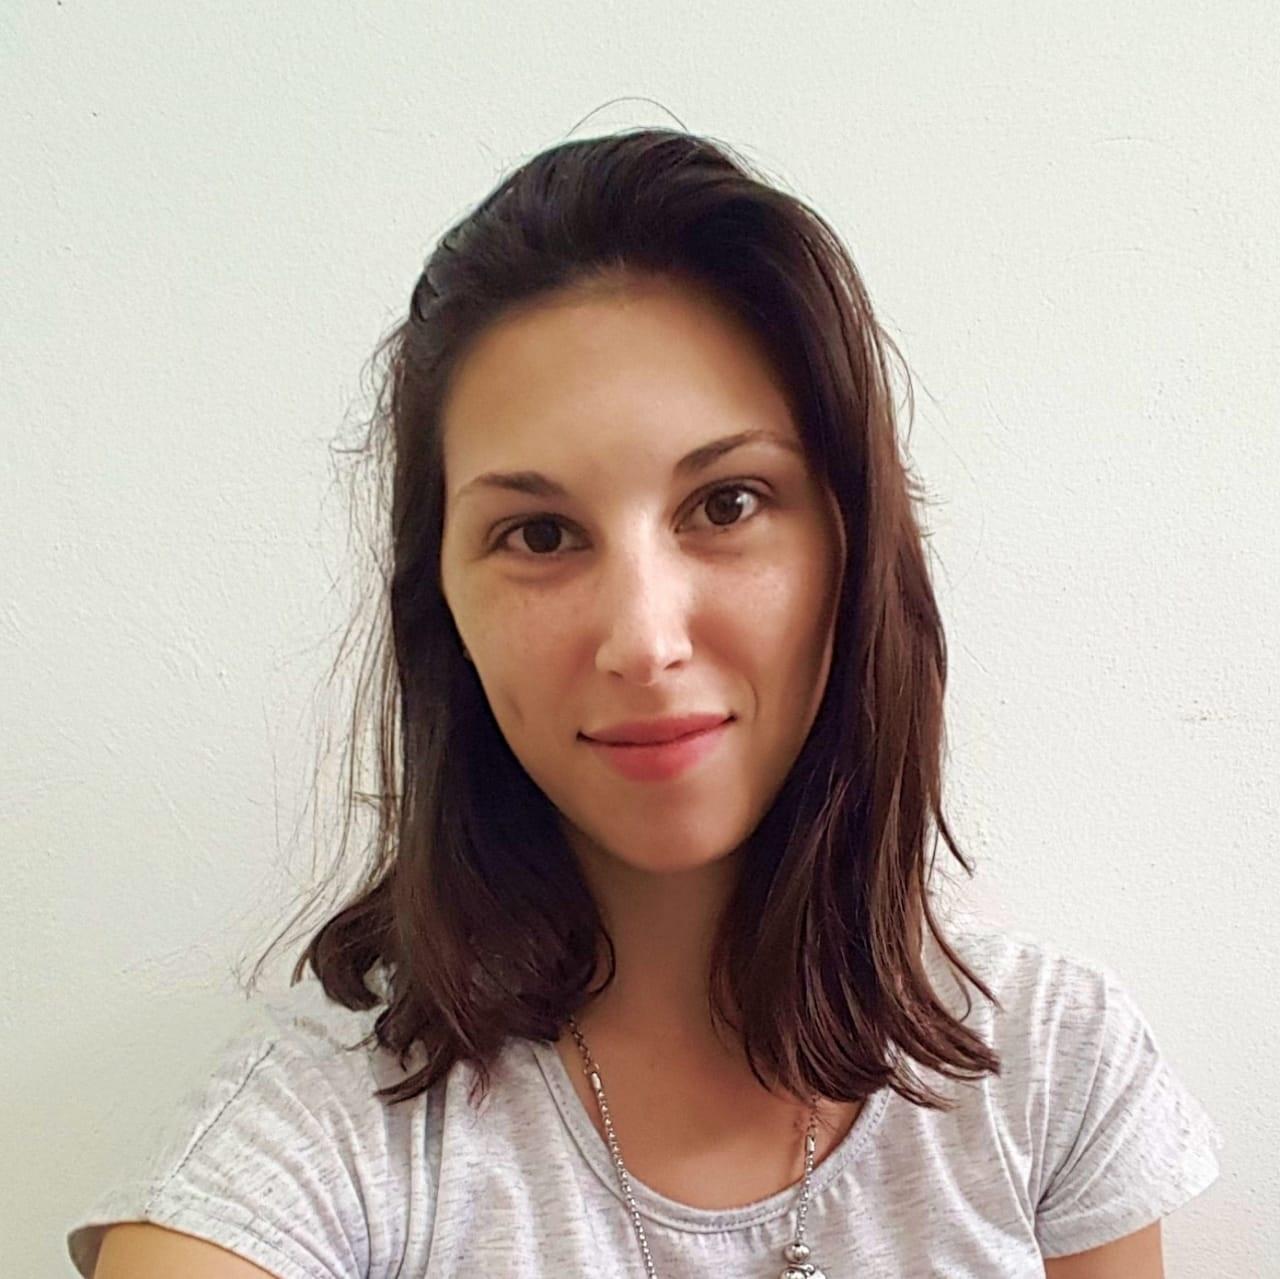 Lic. Agustina Silva